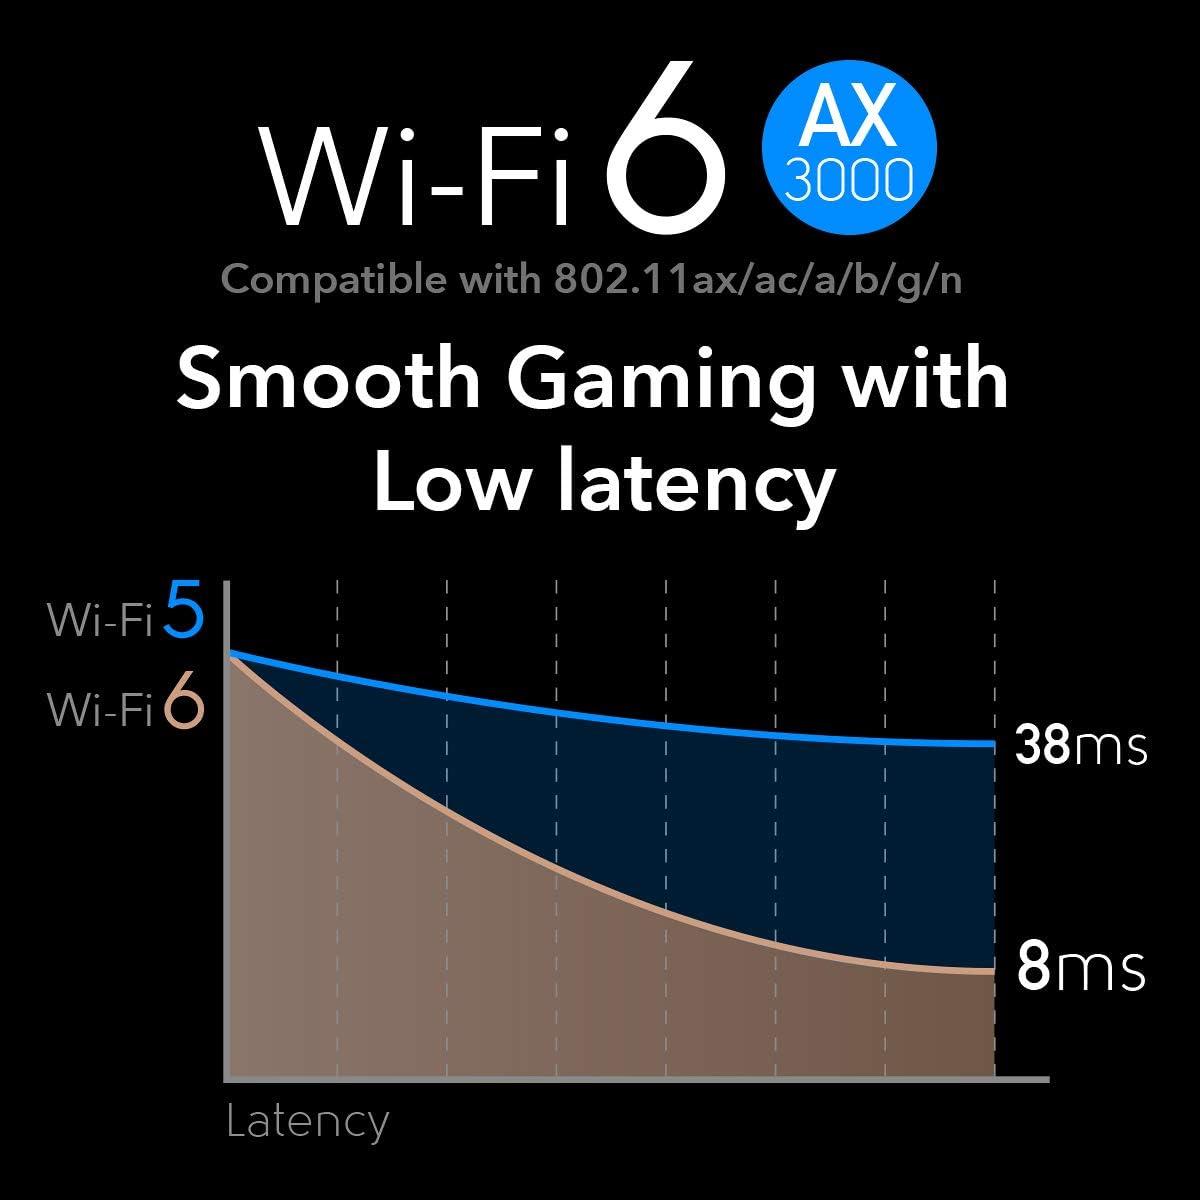 WPA3 Cudy AX3000 WiFi 6 PCIe Card Bluetooth 5.0//4.2//4.0 802.11 ax//ac//a//b//g//n 160MHz Bluetooth 5.0 PCIe Adapter AX200 Inside WE4000 574Mbps 2402Mbps Windows 10 64-bit Only